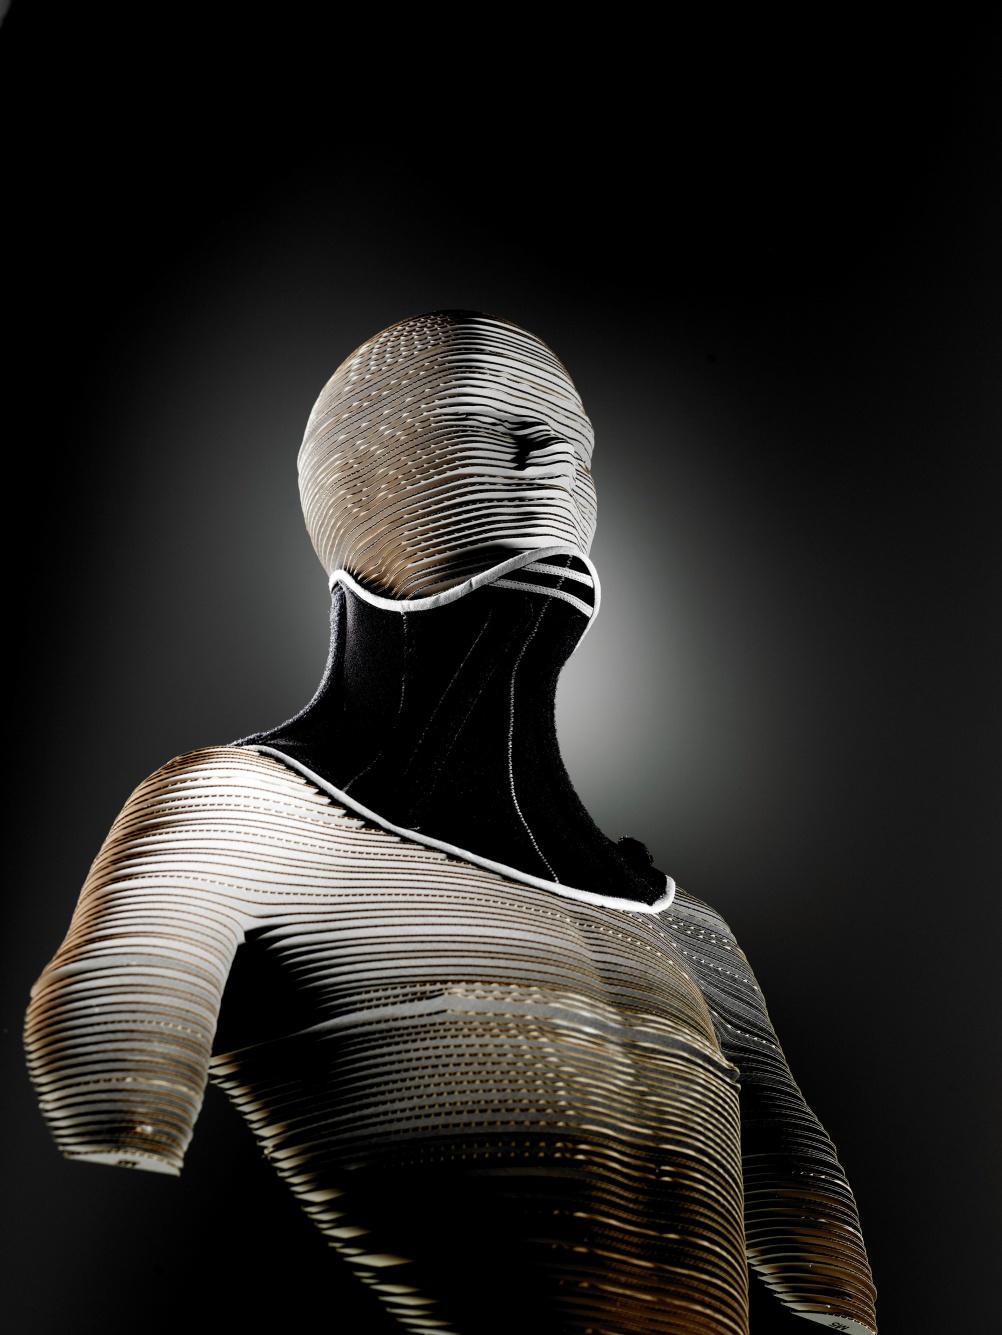 The Sheffield Hallam-designed neck brace (1)